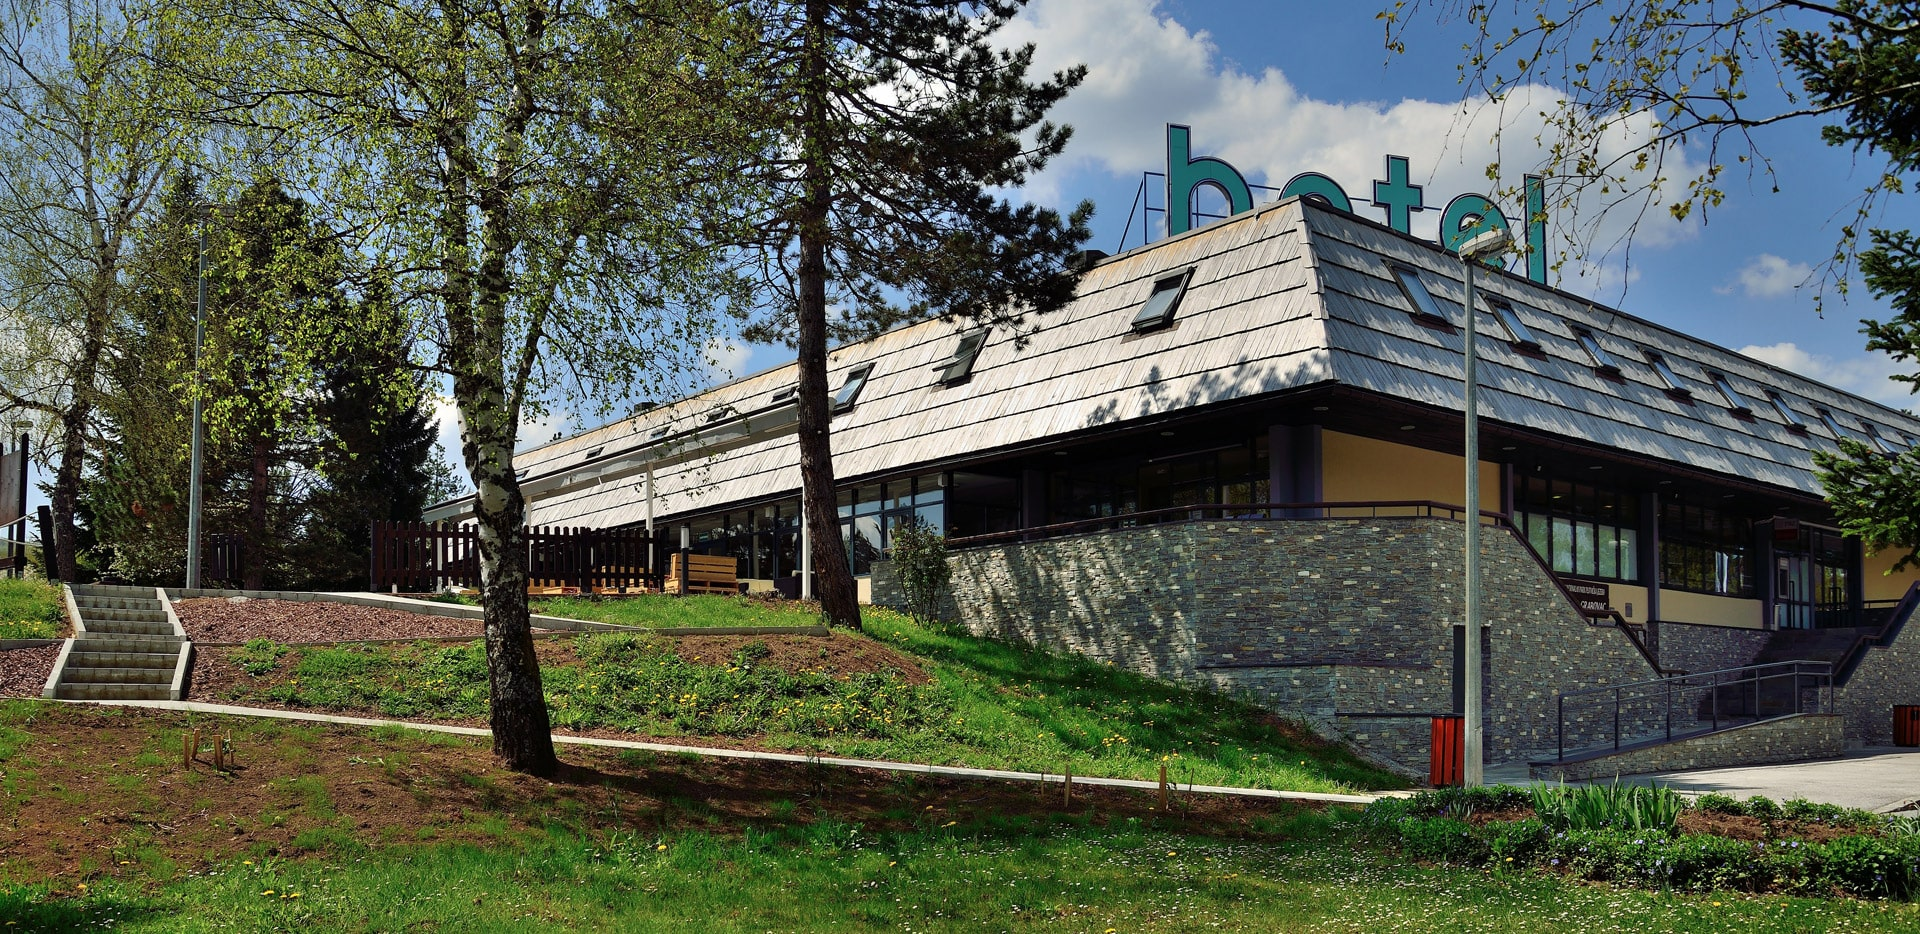 Restoran Grabovac